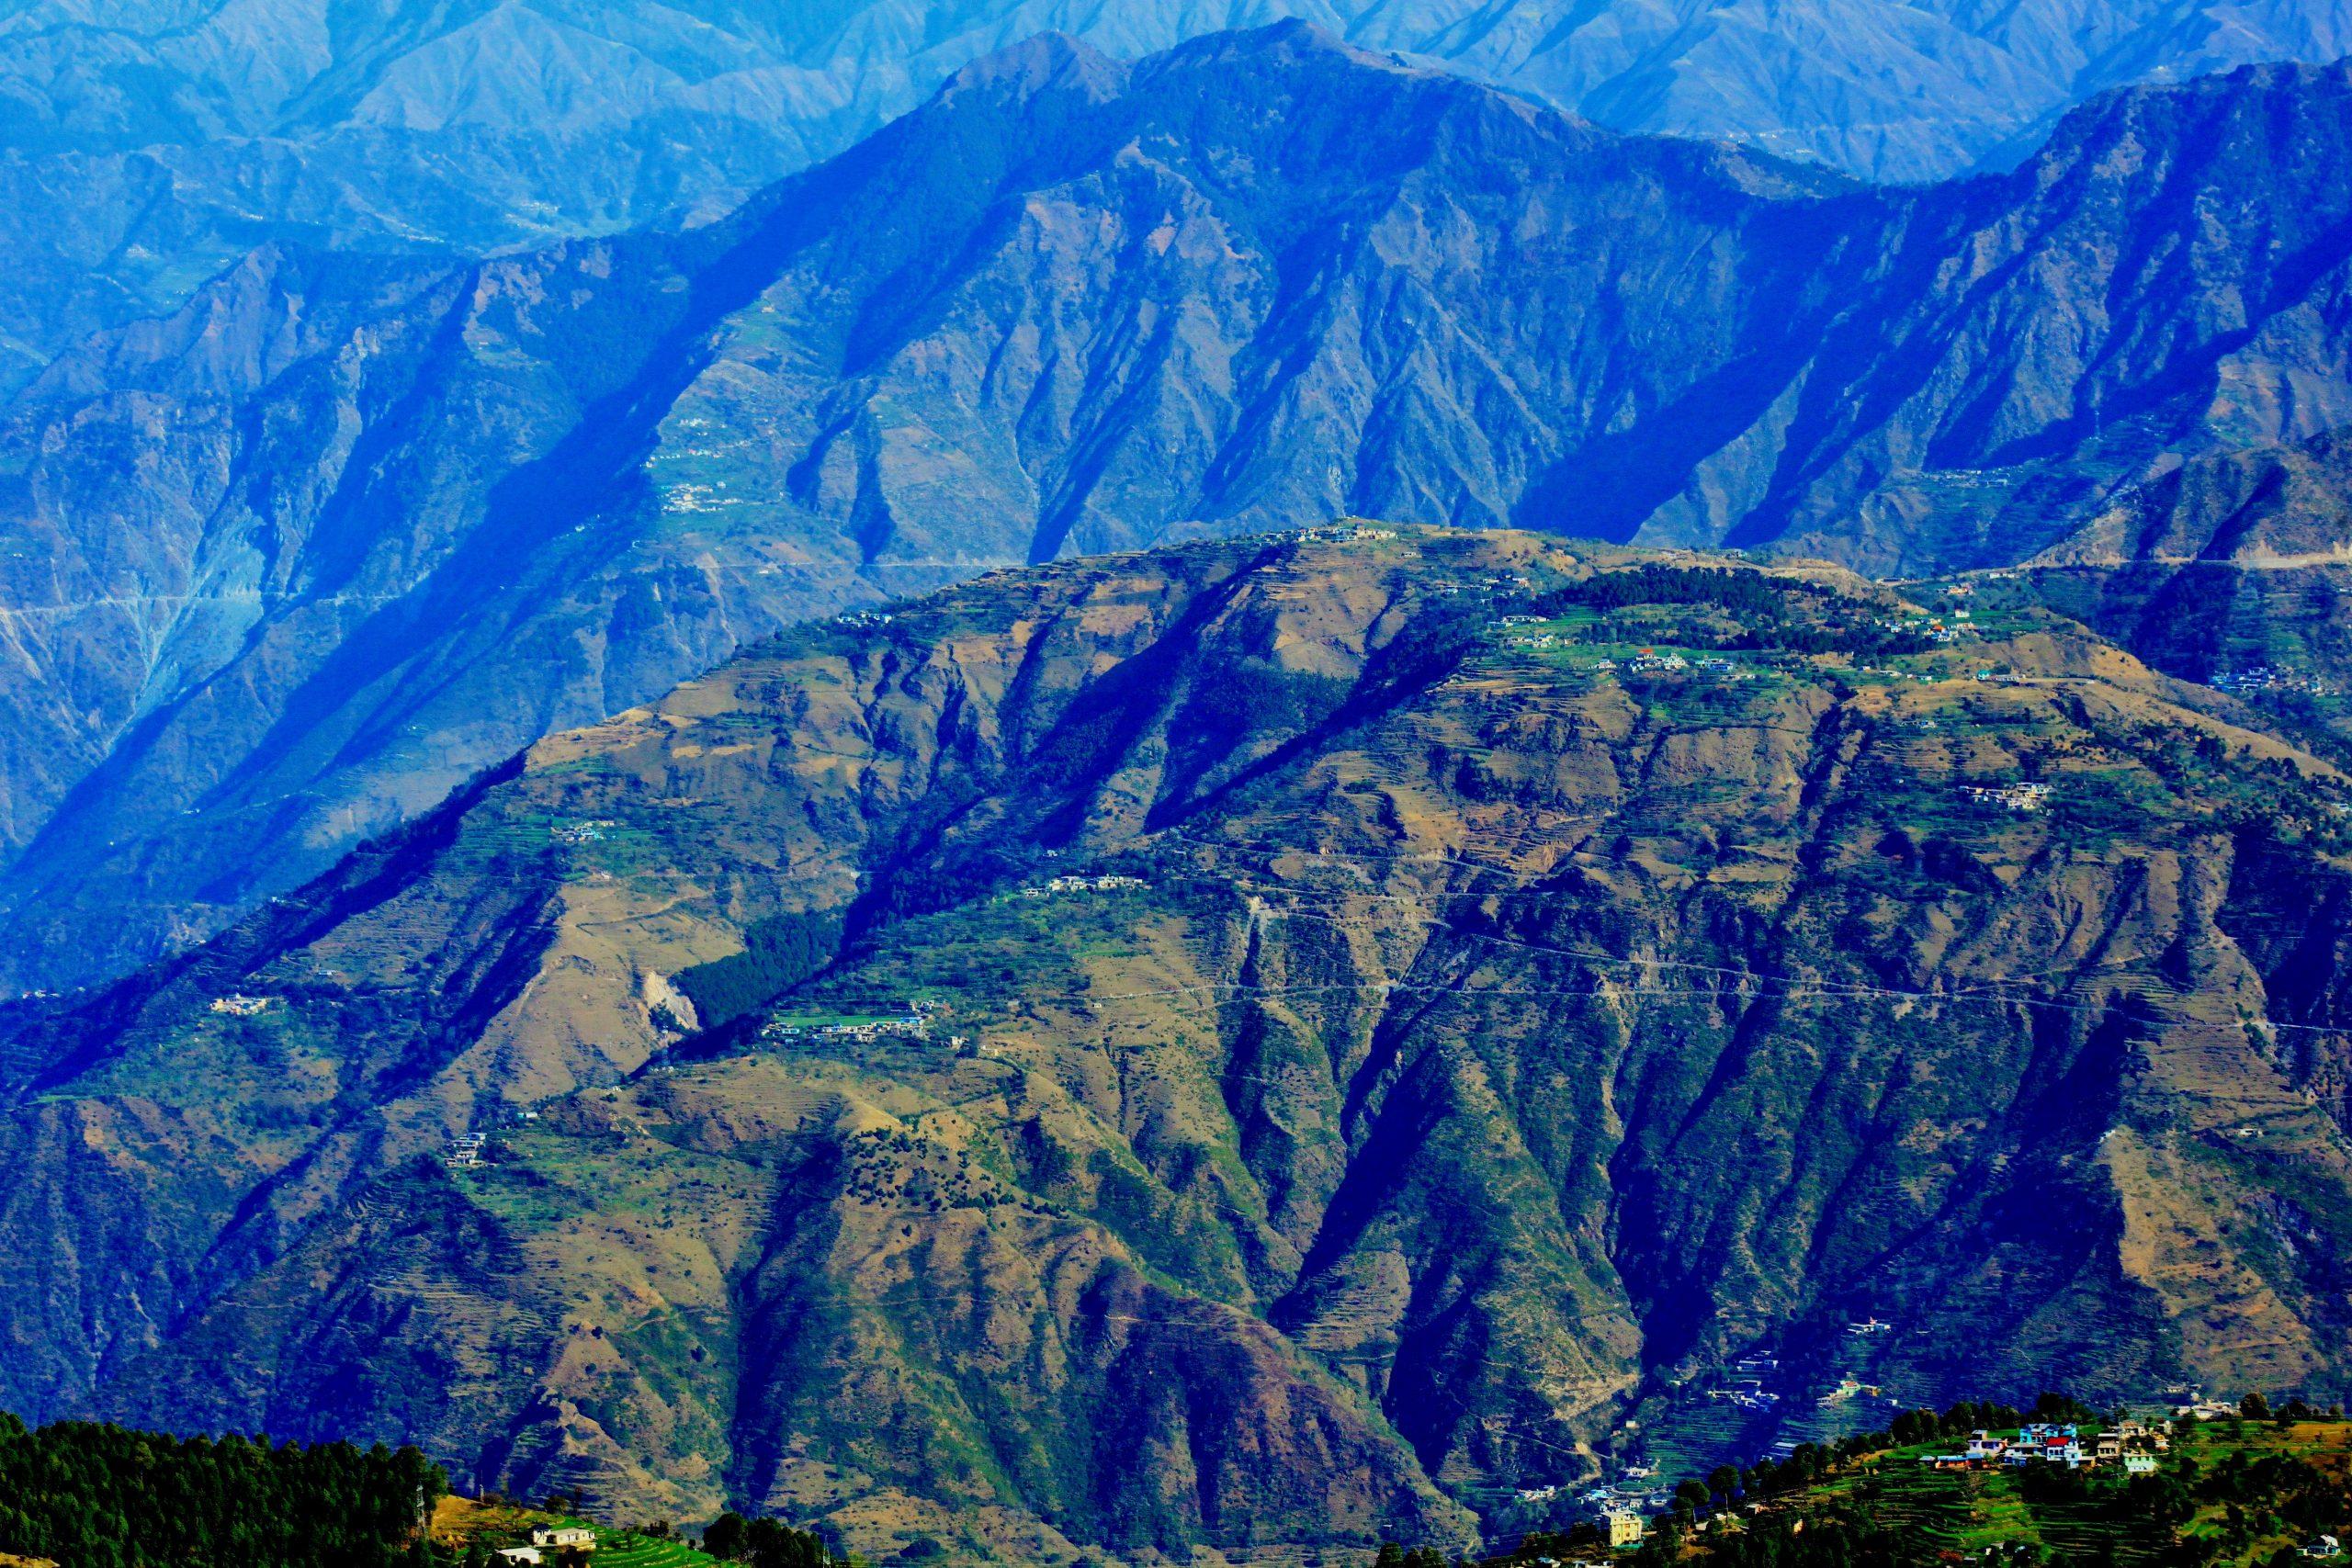 Mountains of Dalhousie, Himachal